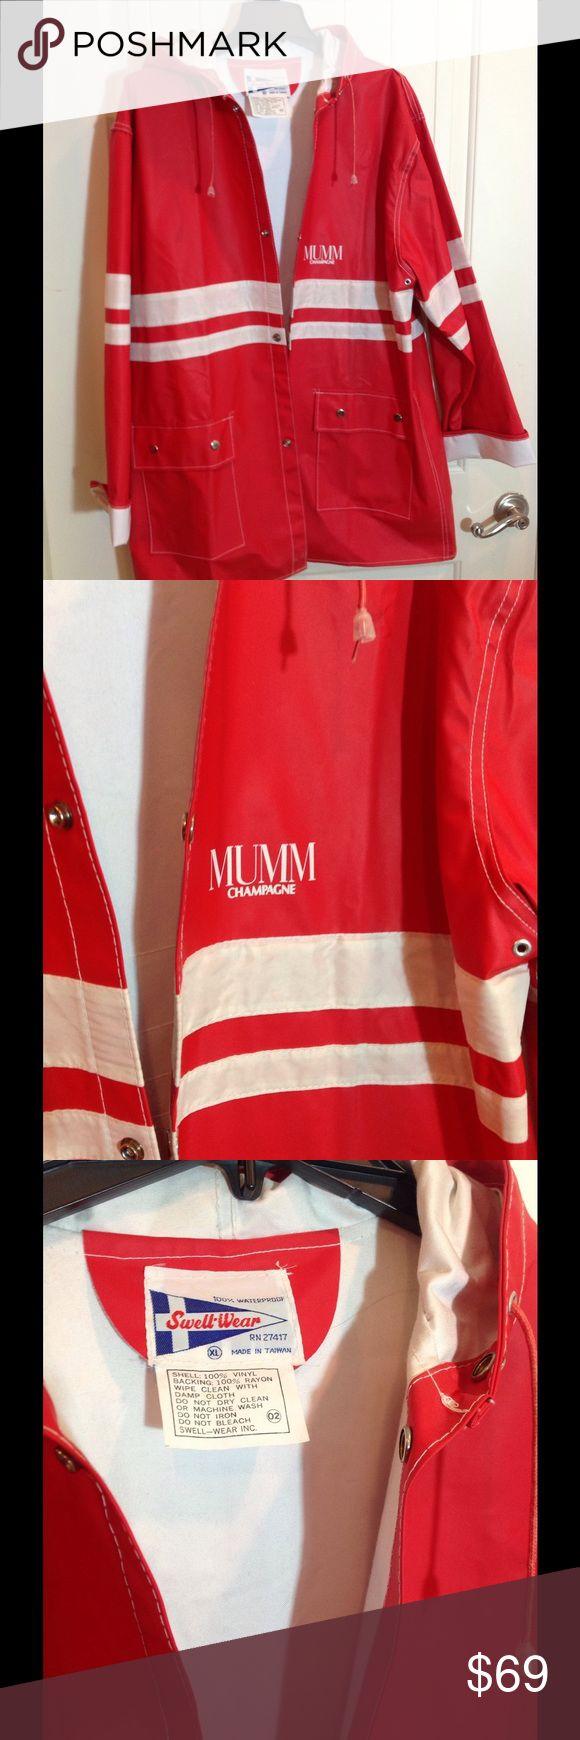 Mens Red Raincoat 100% Waterproof!!  XLg Bright red raincoat.  'Mumm' Champagne logo!  Mens XLg. VERY RARE.  Like new!! Jackets & Coats Raincoats